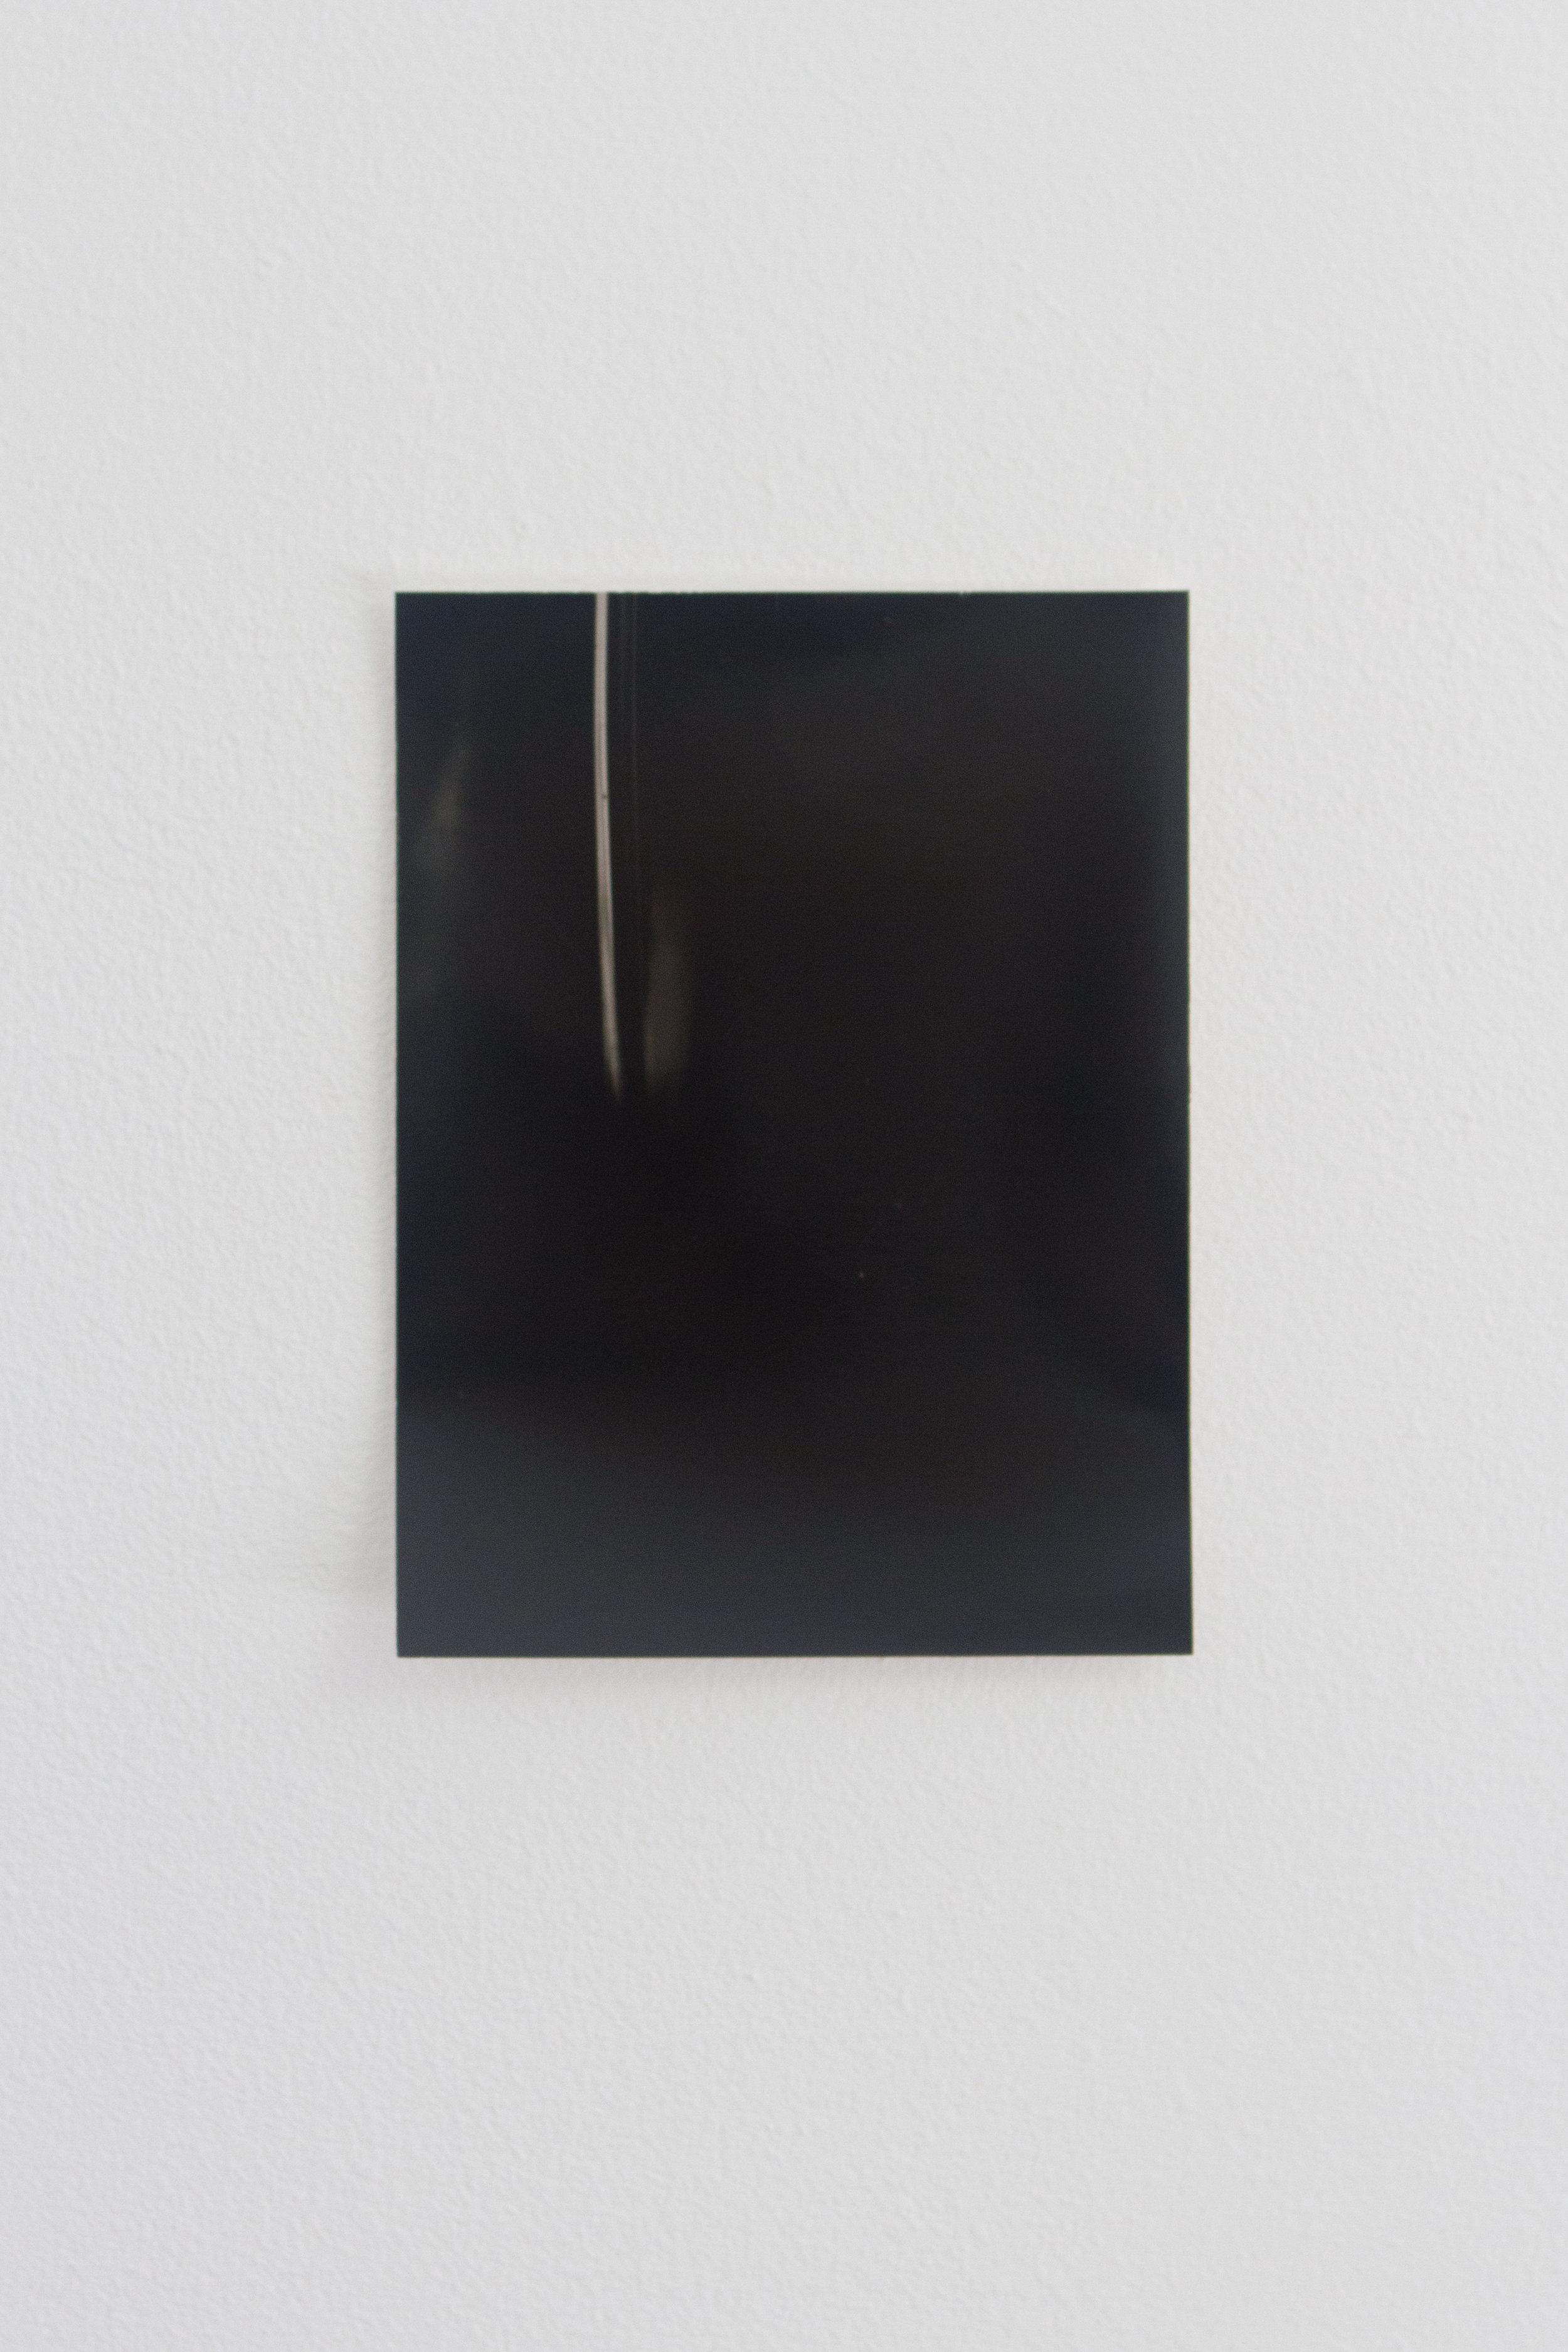 Jason Hendrik Hansma,  Escliz I, II,  2018, Two silver gelatin prints, 12.3 x 13 cm, 9.5 x 12.8 cm